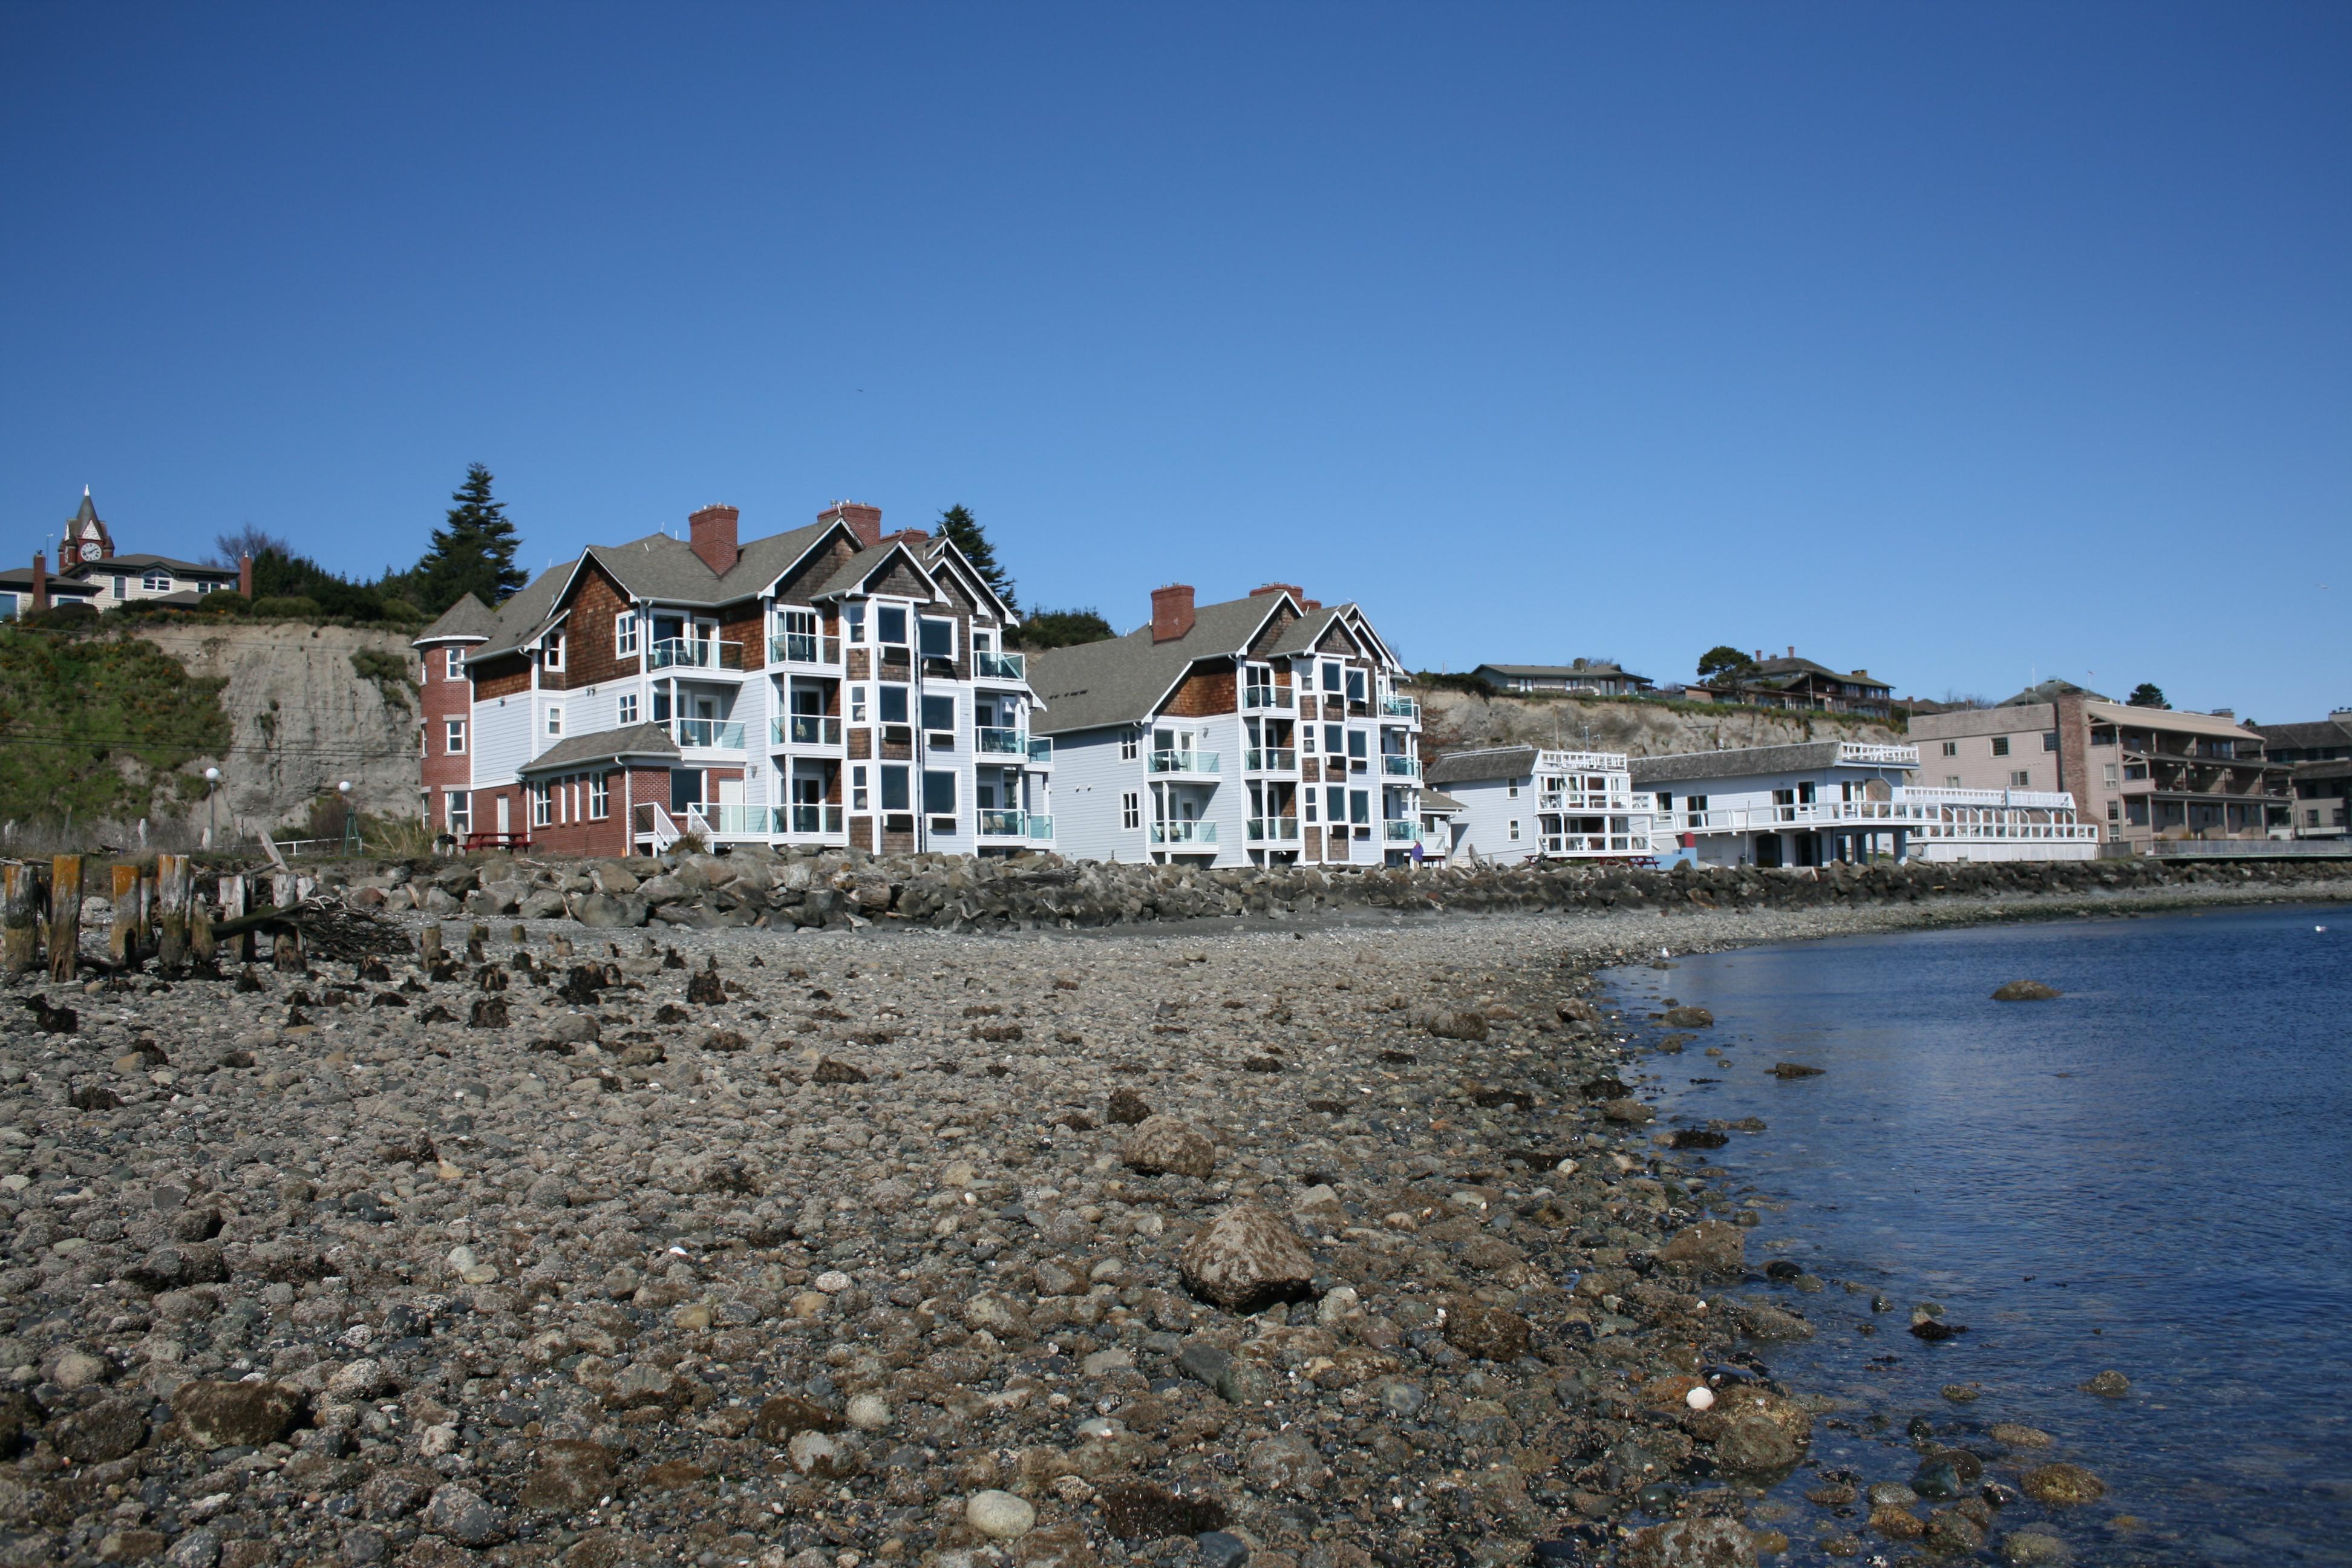 tides inn in port townsend tides inn 1807 water st port. Black Bedroom Furniture Sets. Home Design Ideas